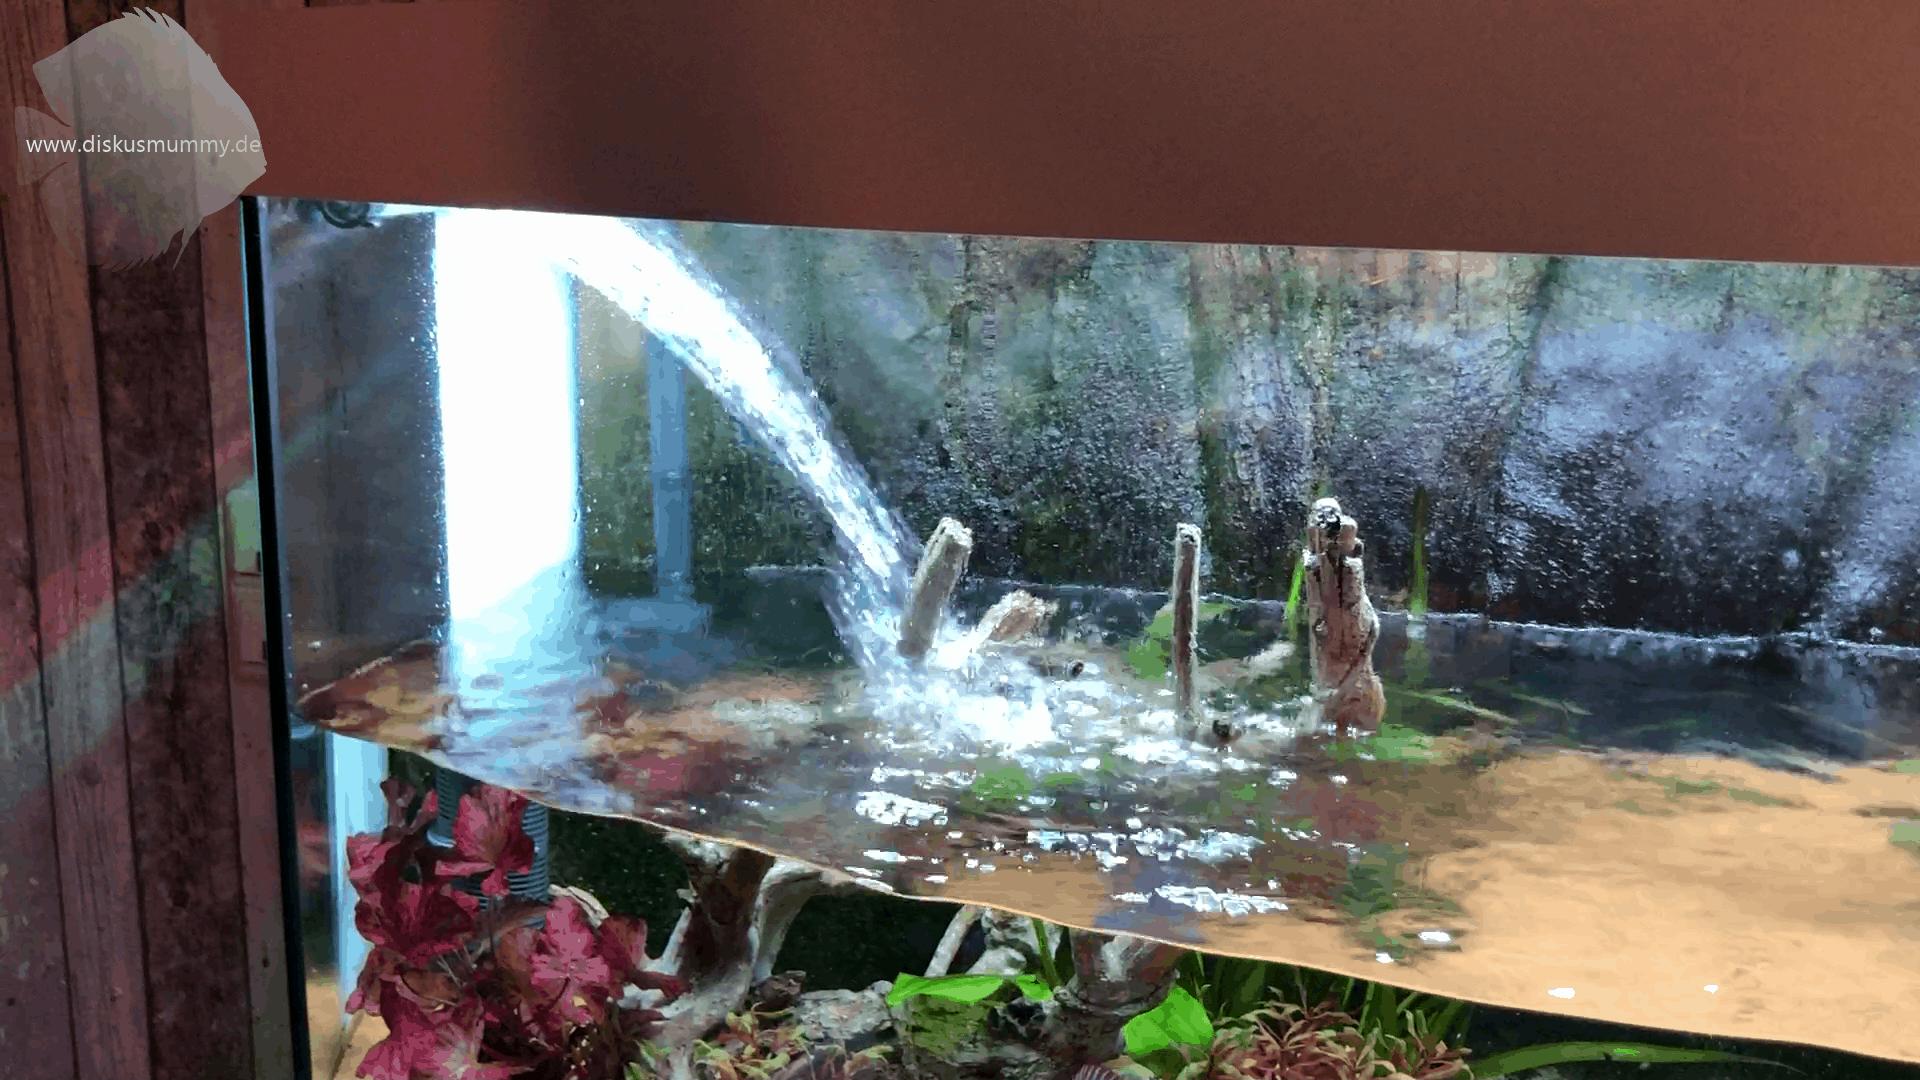 Wasserwechsel einmal anders! 6